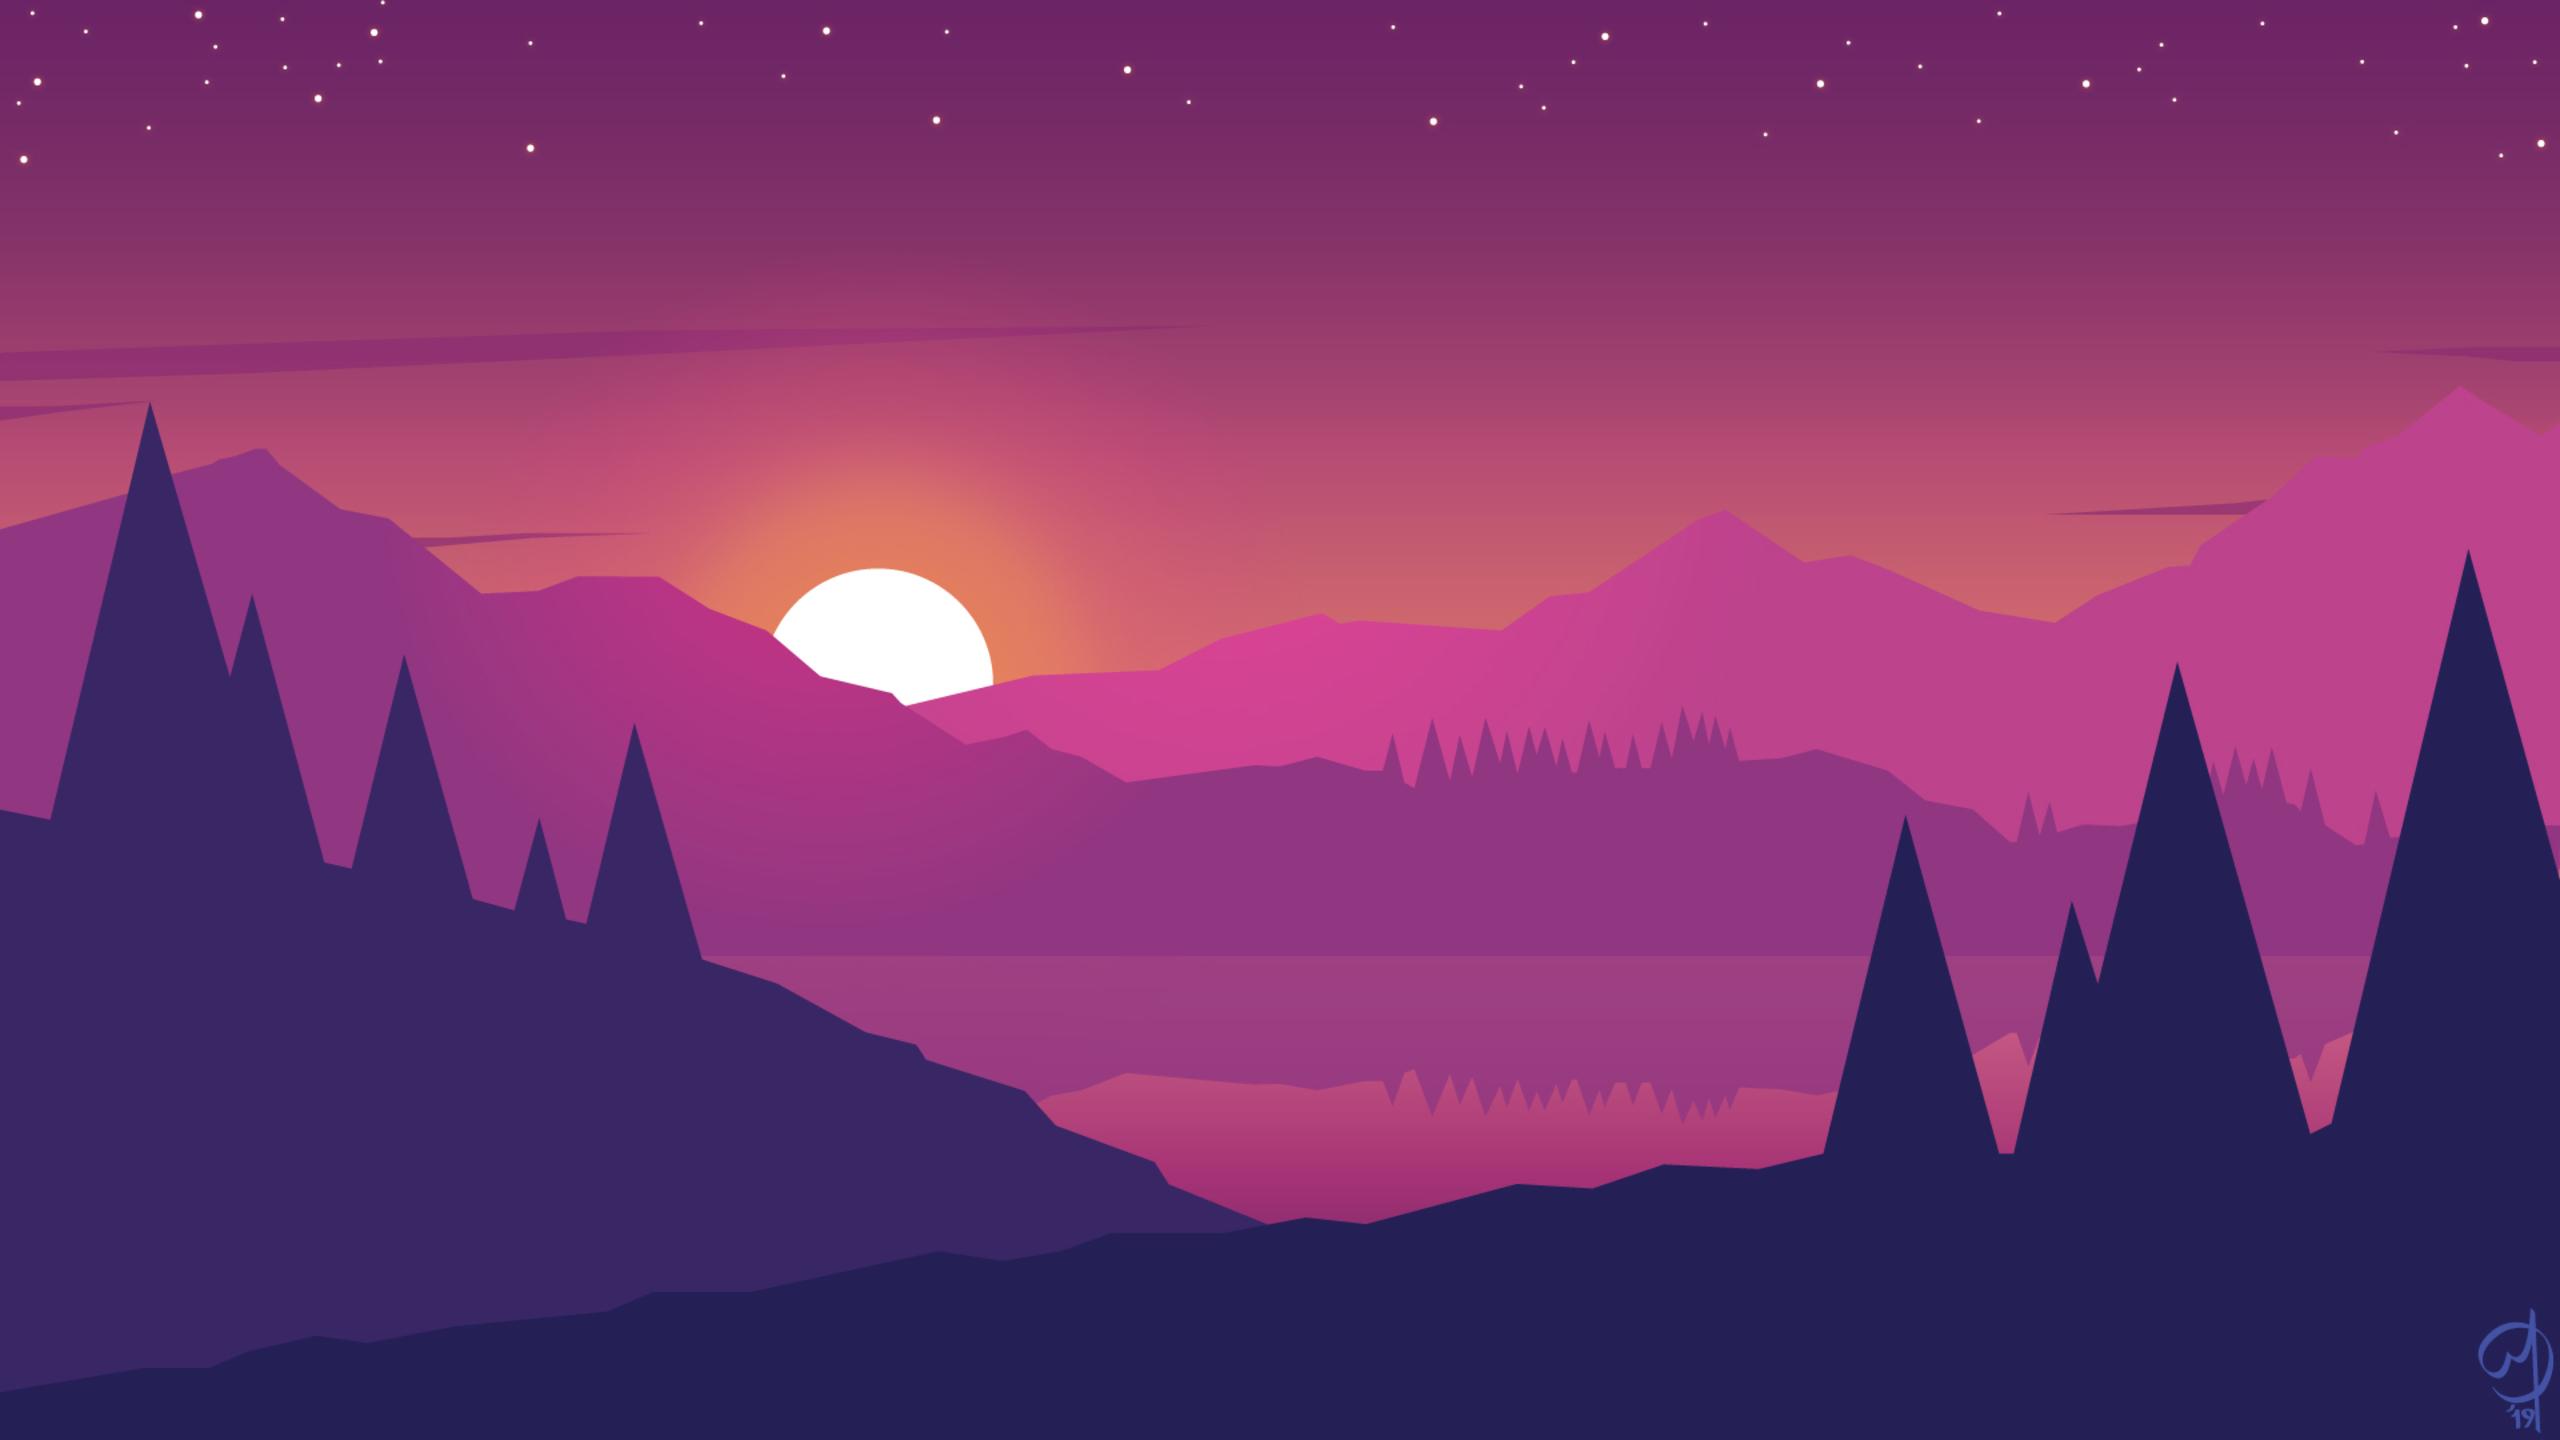 2560x1440 Minimalist Mountains Landscape Scenery 1440P ...